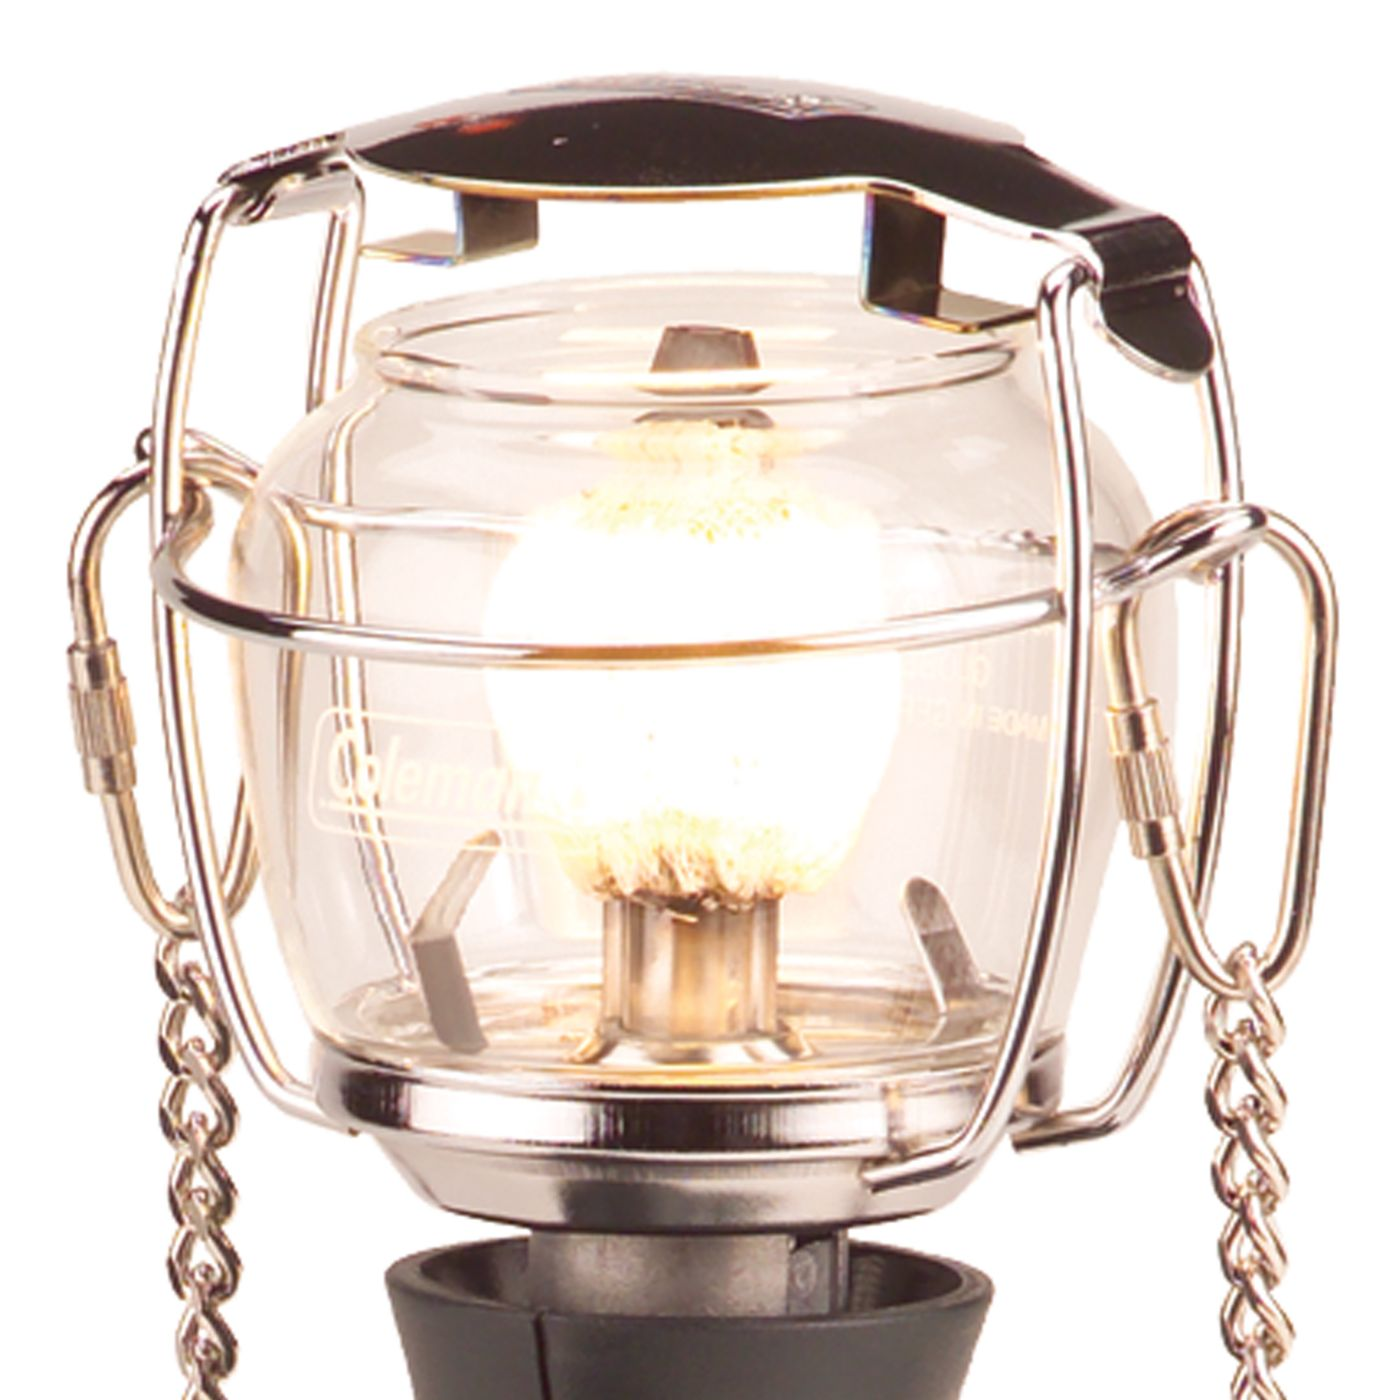 Awesome ... Compact Propane Lantern ...